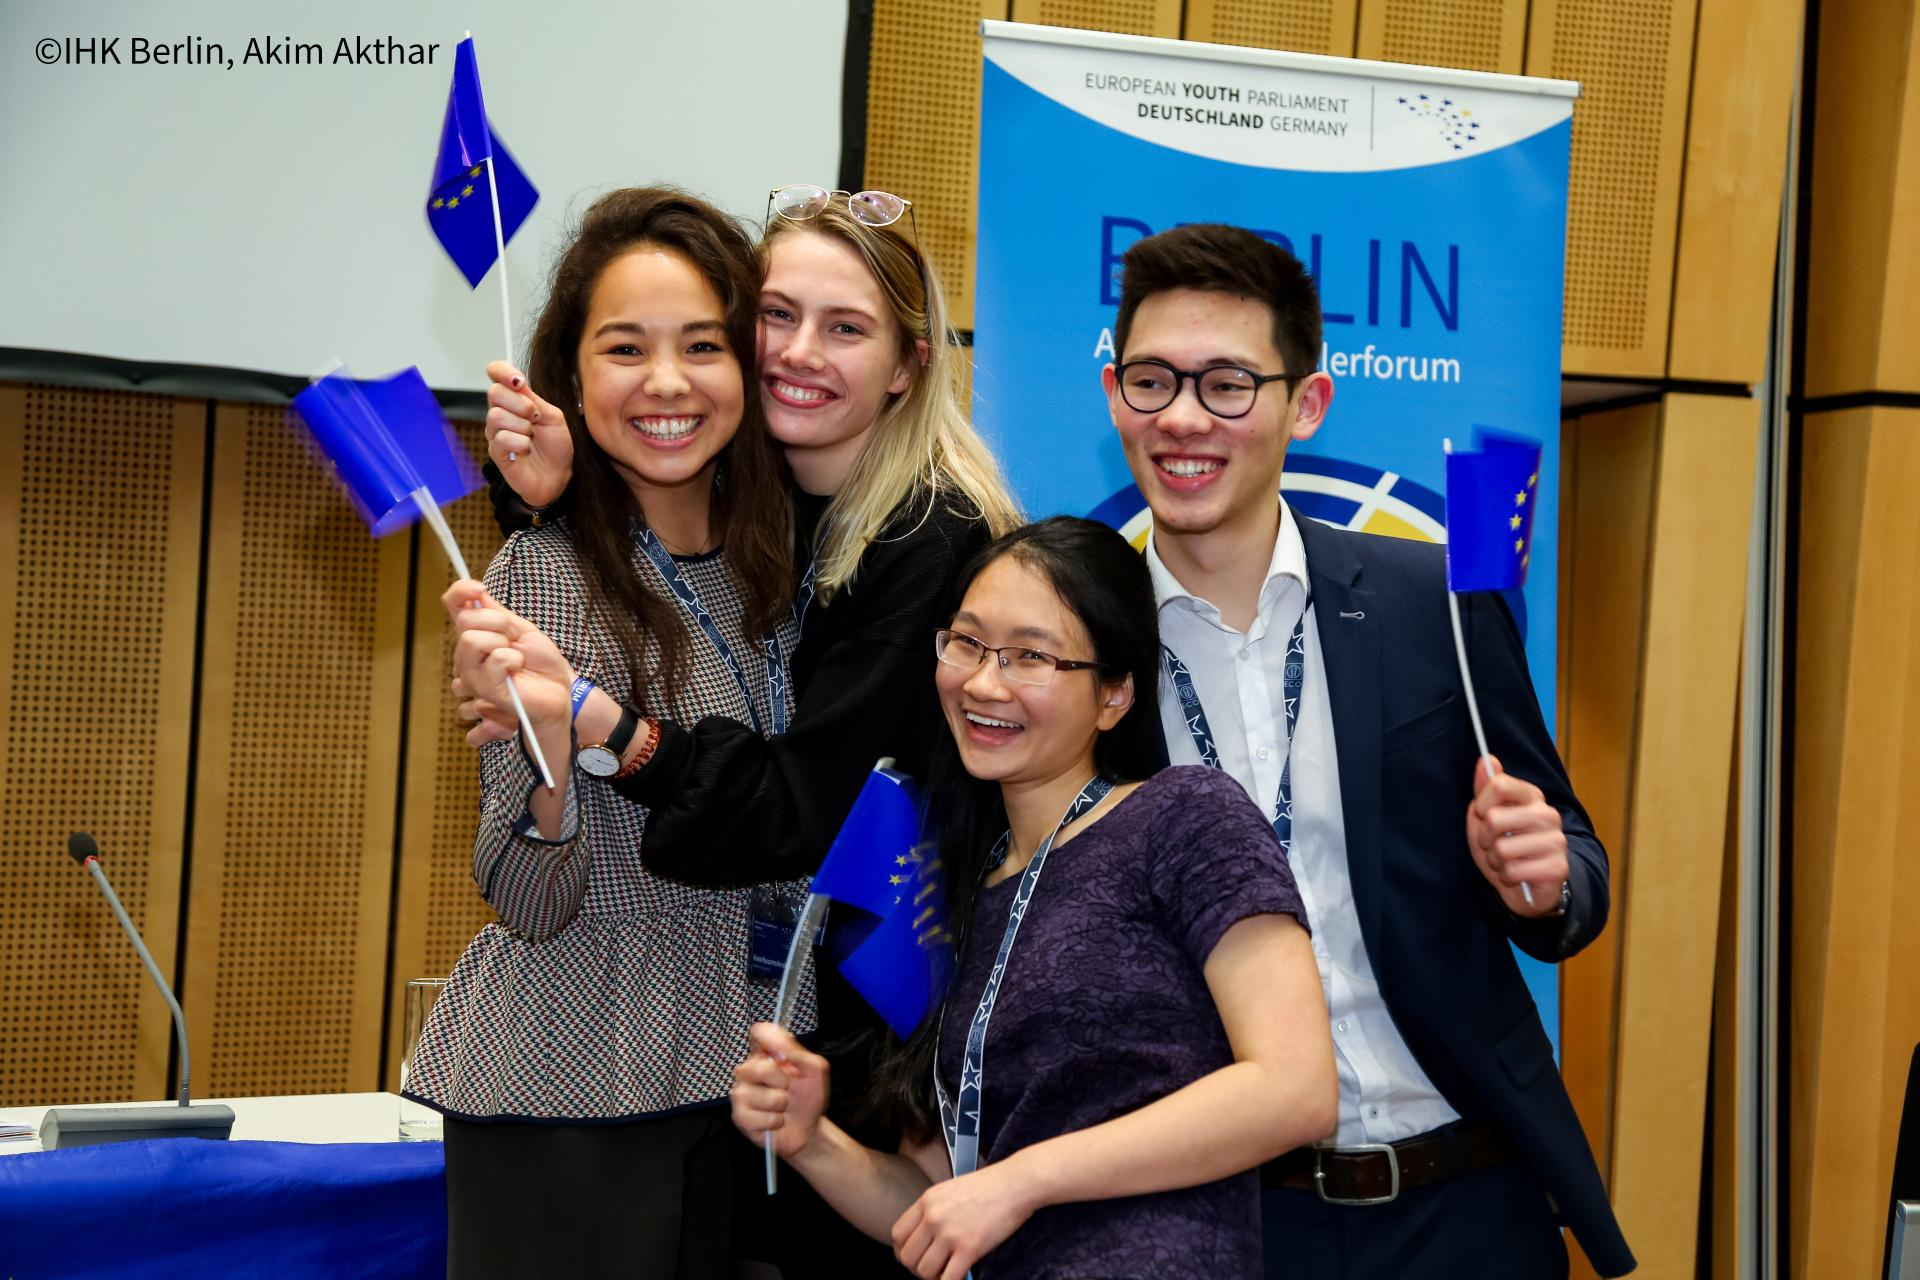 Europäisches Jugendparlament Azubi- und Schülerforum